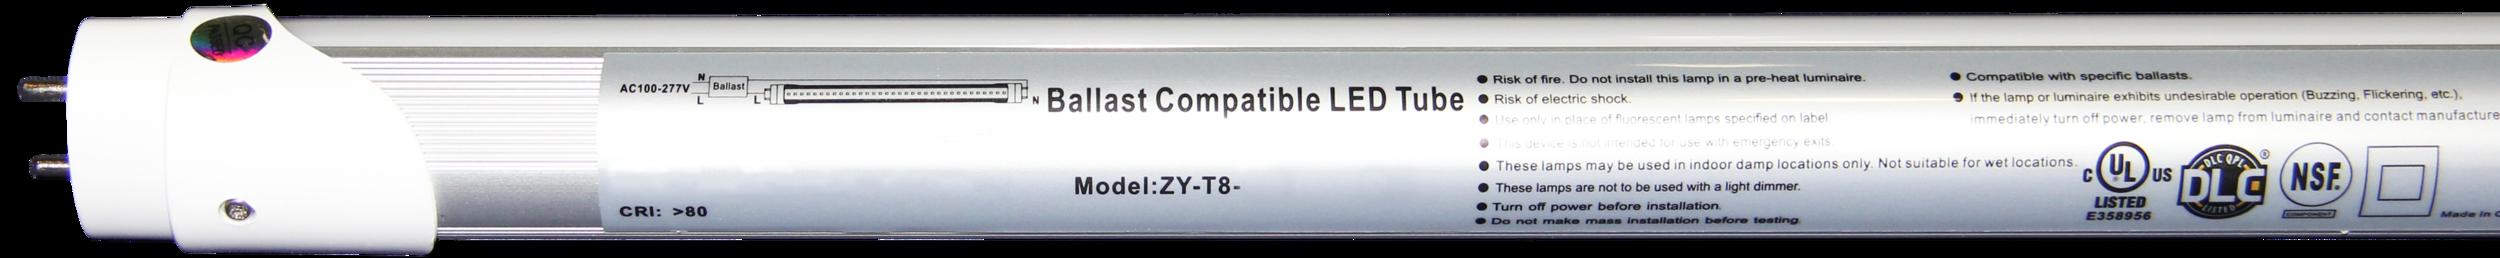 ZY-T8 LED TUBES, JAMES LIGHTING, JL LIGHTING, FLOURESCENT REPLACEMENT, 4 FOOT LED TUBES, 4 FOOT LIGHTS, COMMERCIAL LED LIGHTING, COMMERCIAL LEDS, LED LIGHTS, LED LIGHTING, ZY-T8-